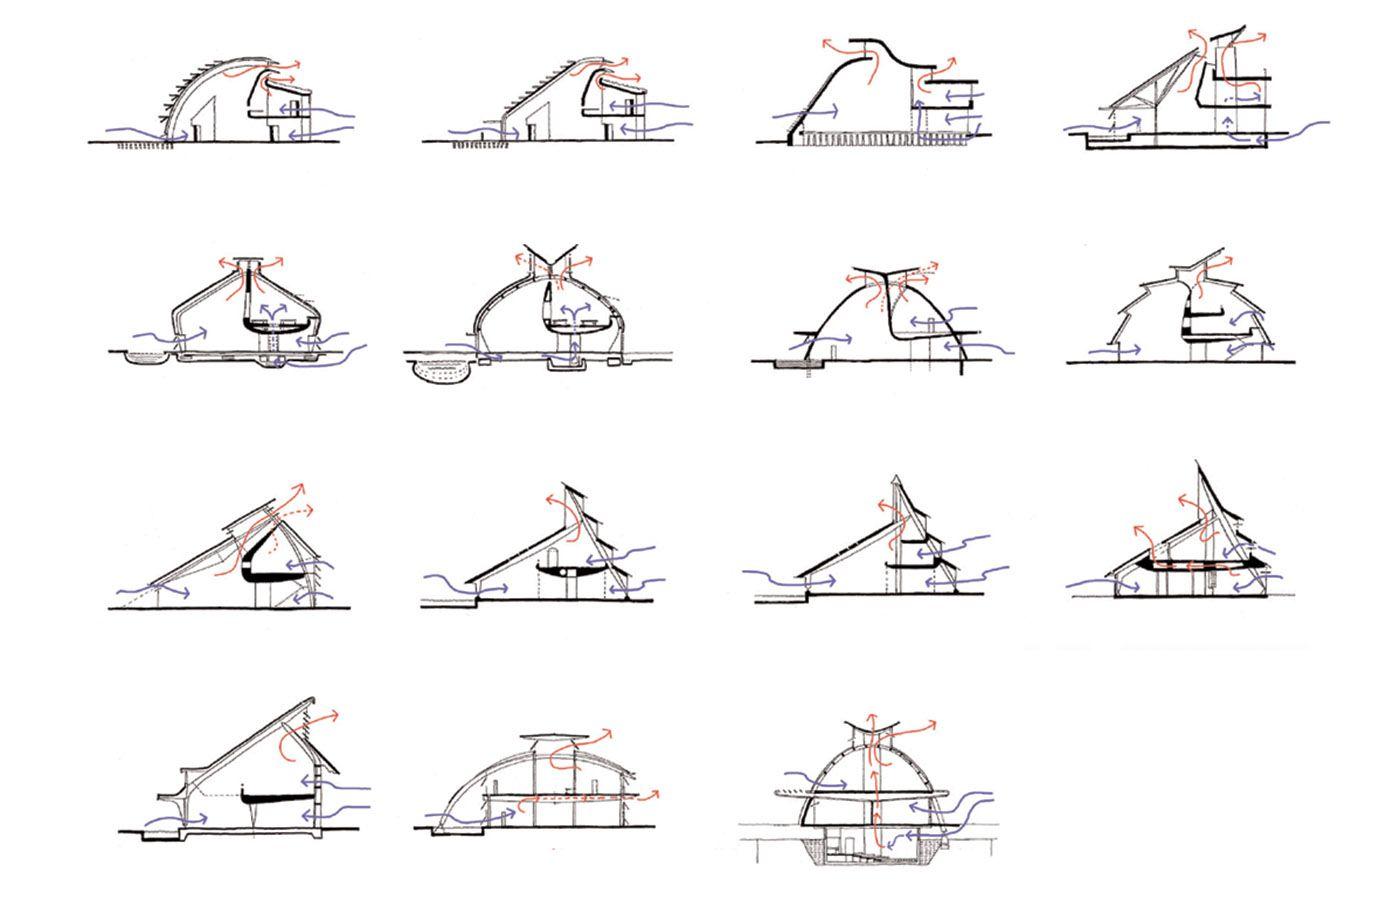 Pin By Kelli Kimura On Concept Diagrams